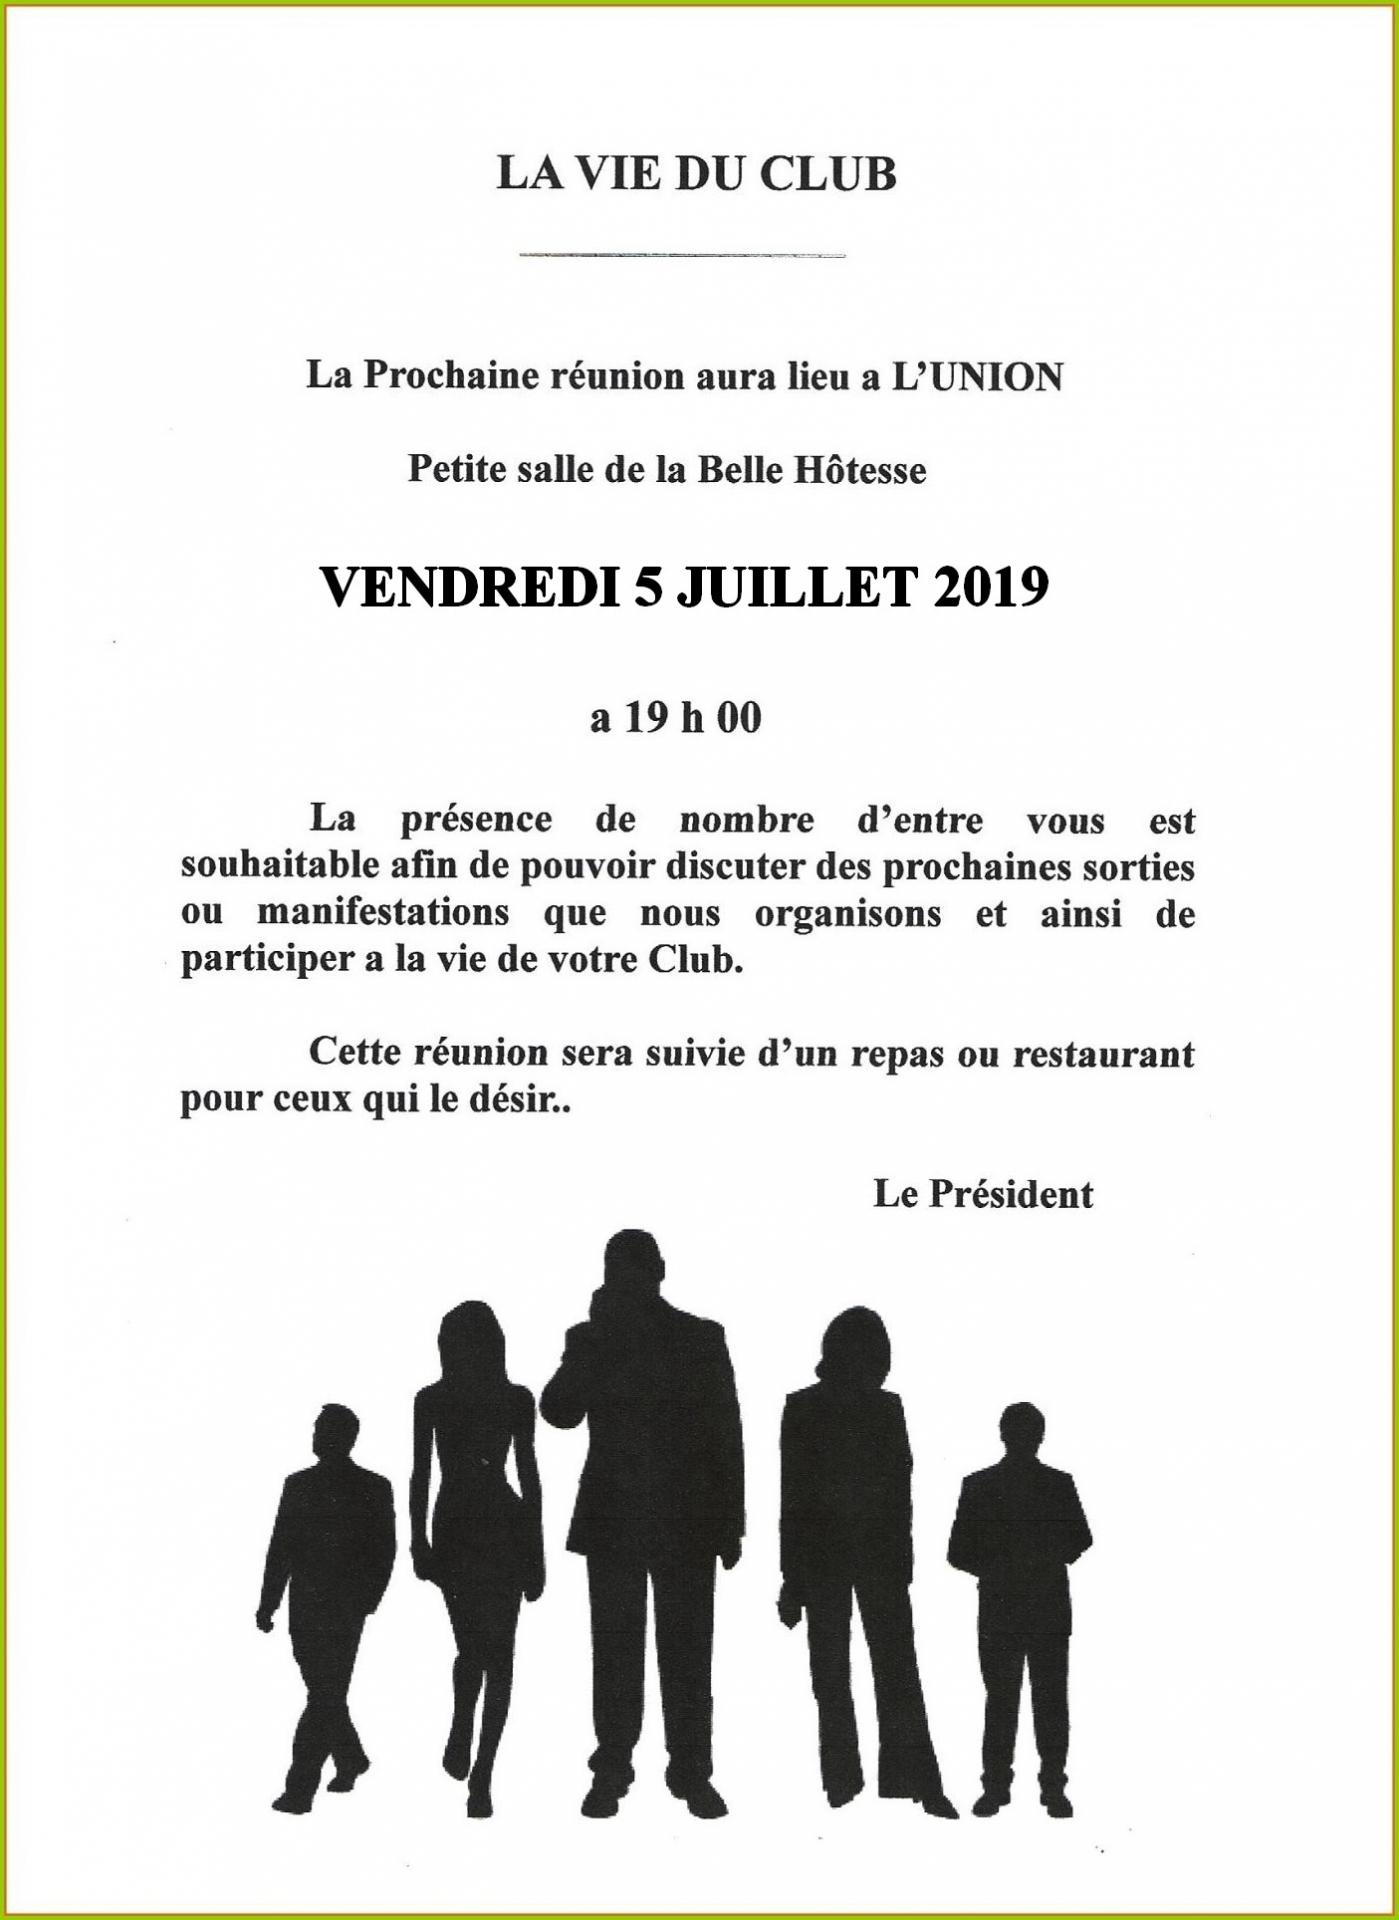 Reunion belle hotesse 07 2019